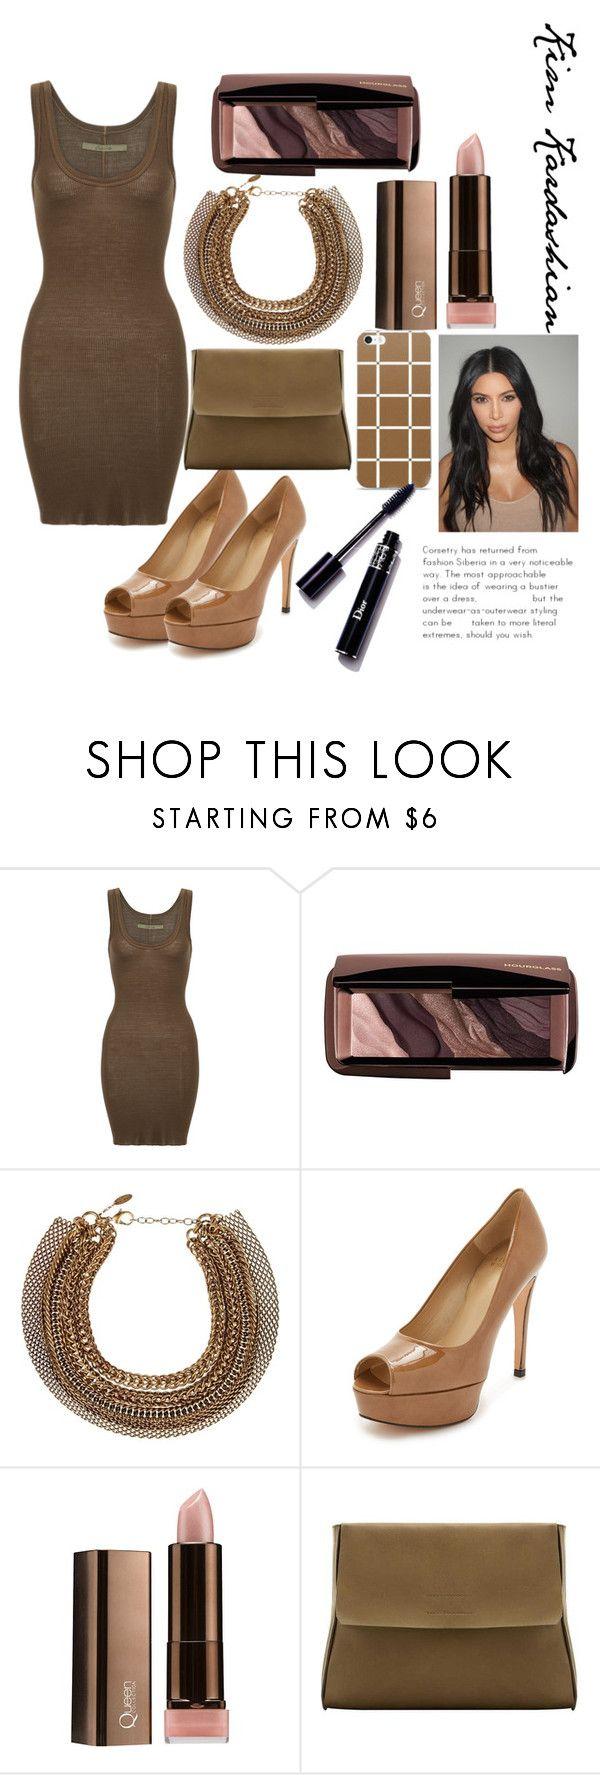 """@kimk7 Kim Kardashian"" by alealesia3 ❤ liked on Polyvore featuring Enza Costa, Hourglass Cosmetics, Roberto Cavalli, Stuart Weitzman, COVERGIRL and MANGO"